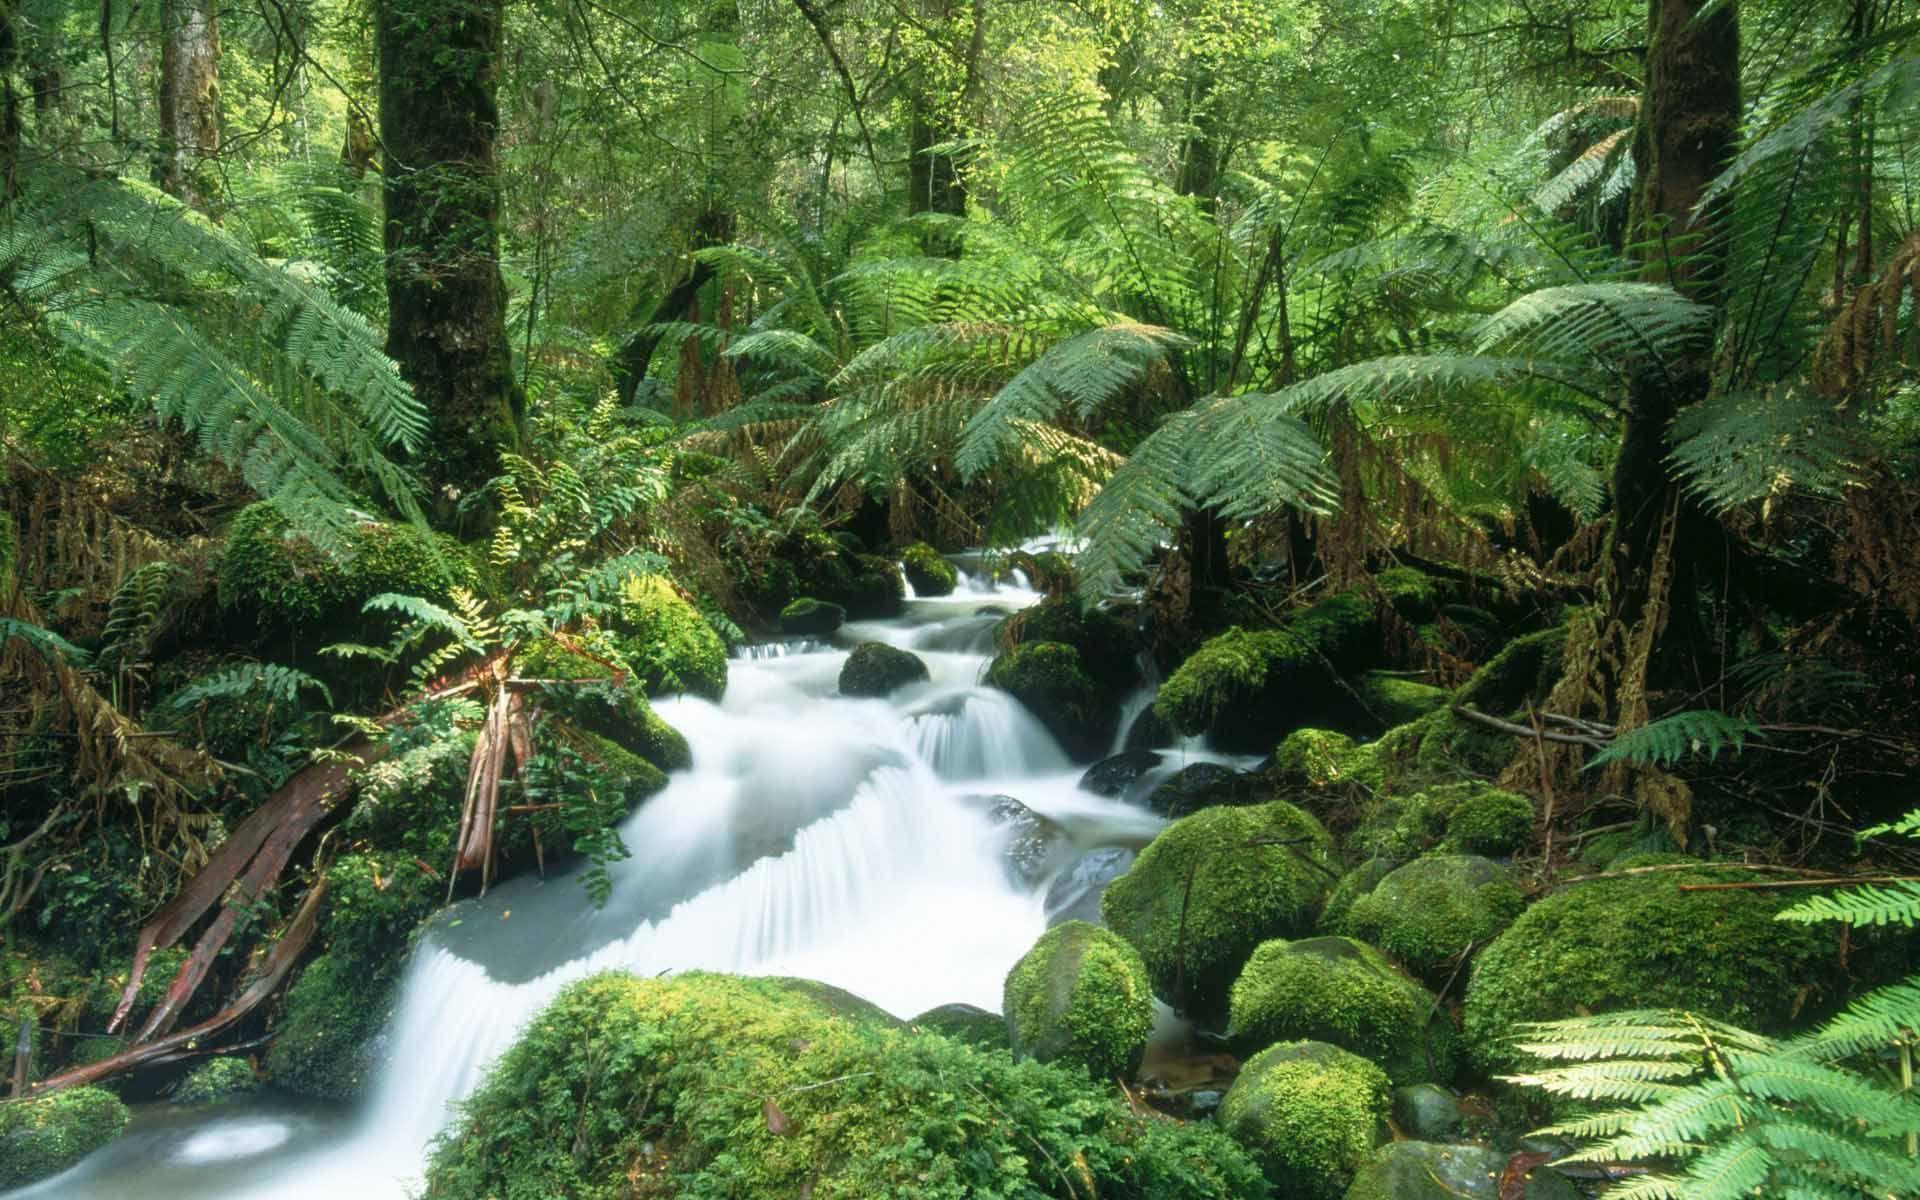 Fond D Ecran Torent En Pleine Nature Wallpaper Fond D Ecran Cascade Les Cascades Foret Tropicale